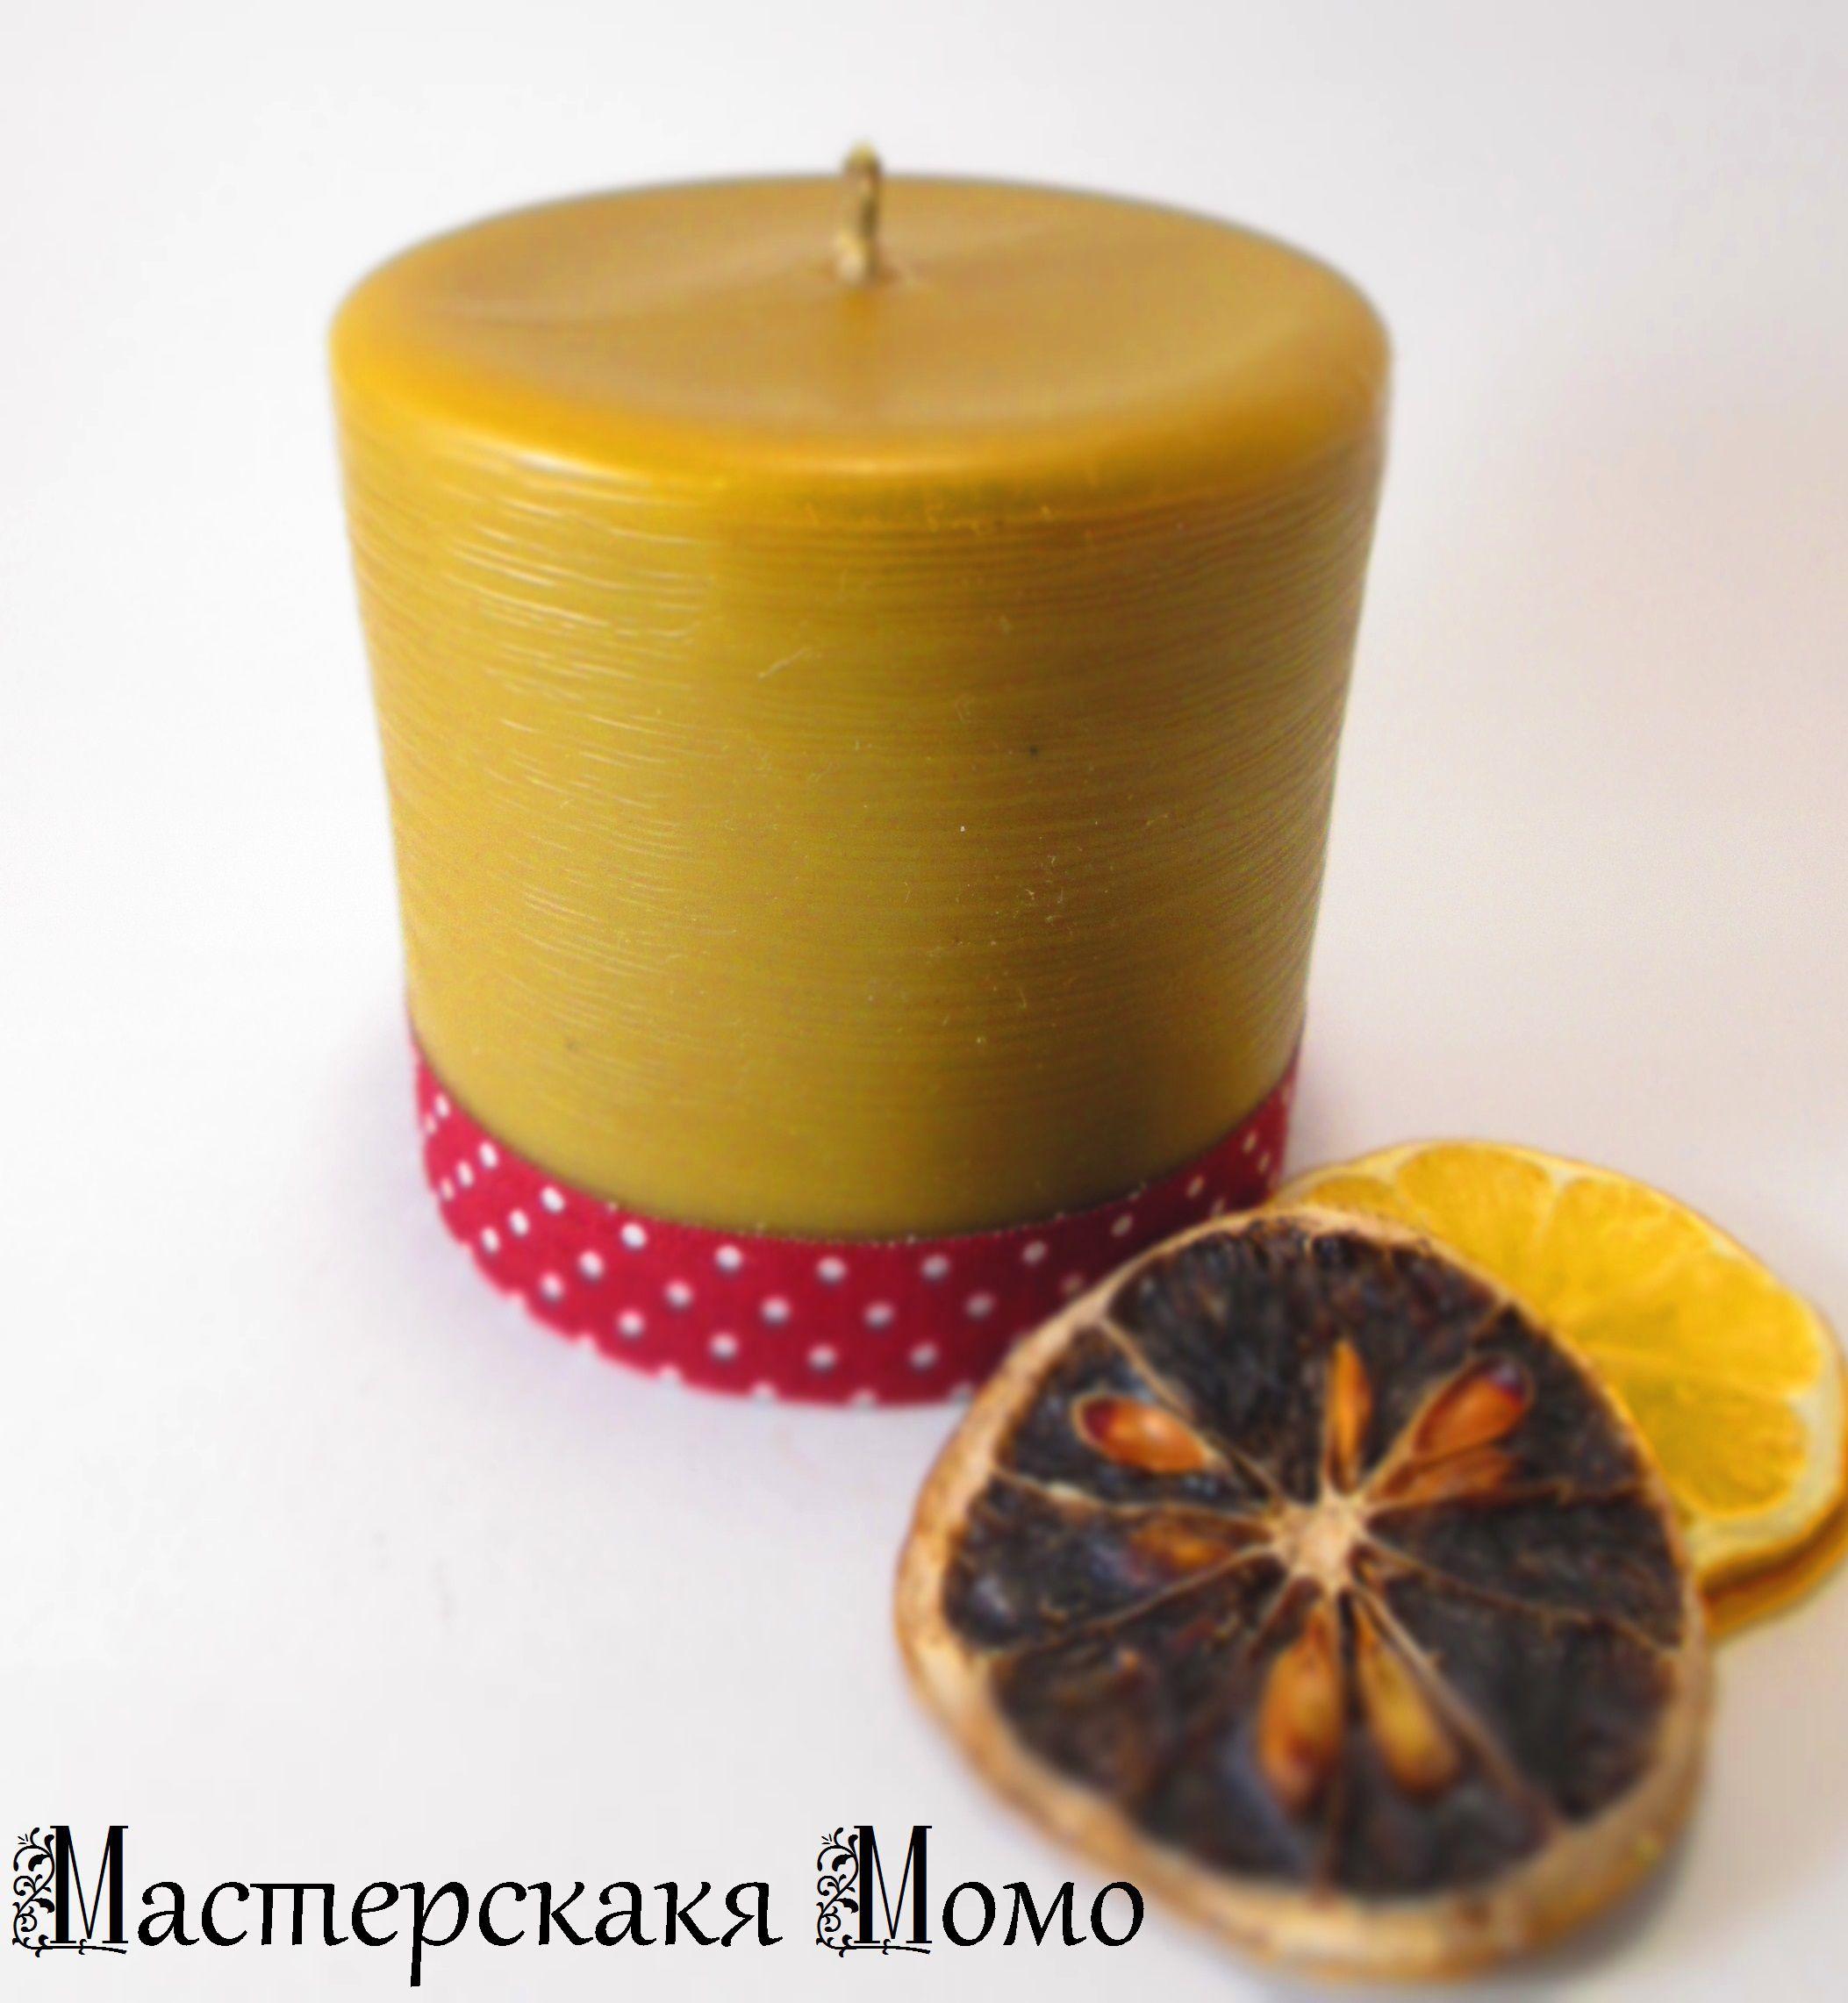 souvenir candle tender gift wax relationship date handmade romance love